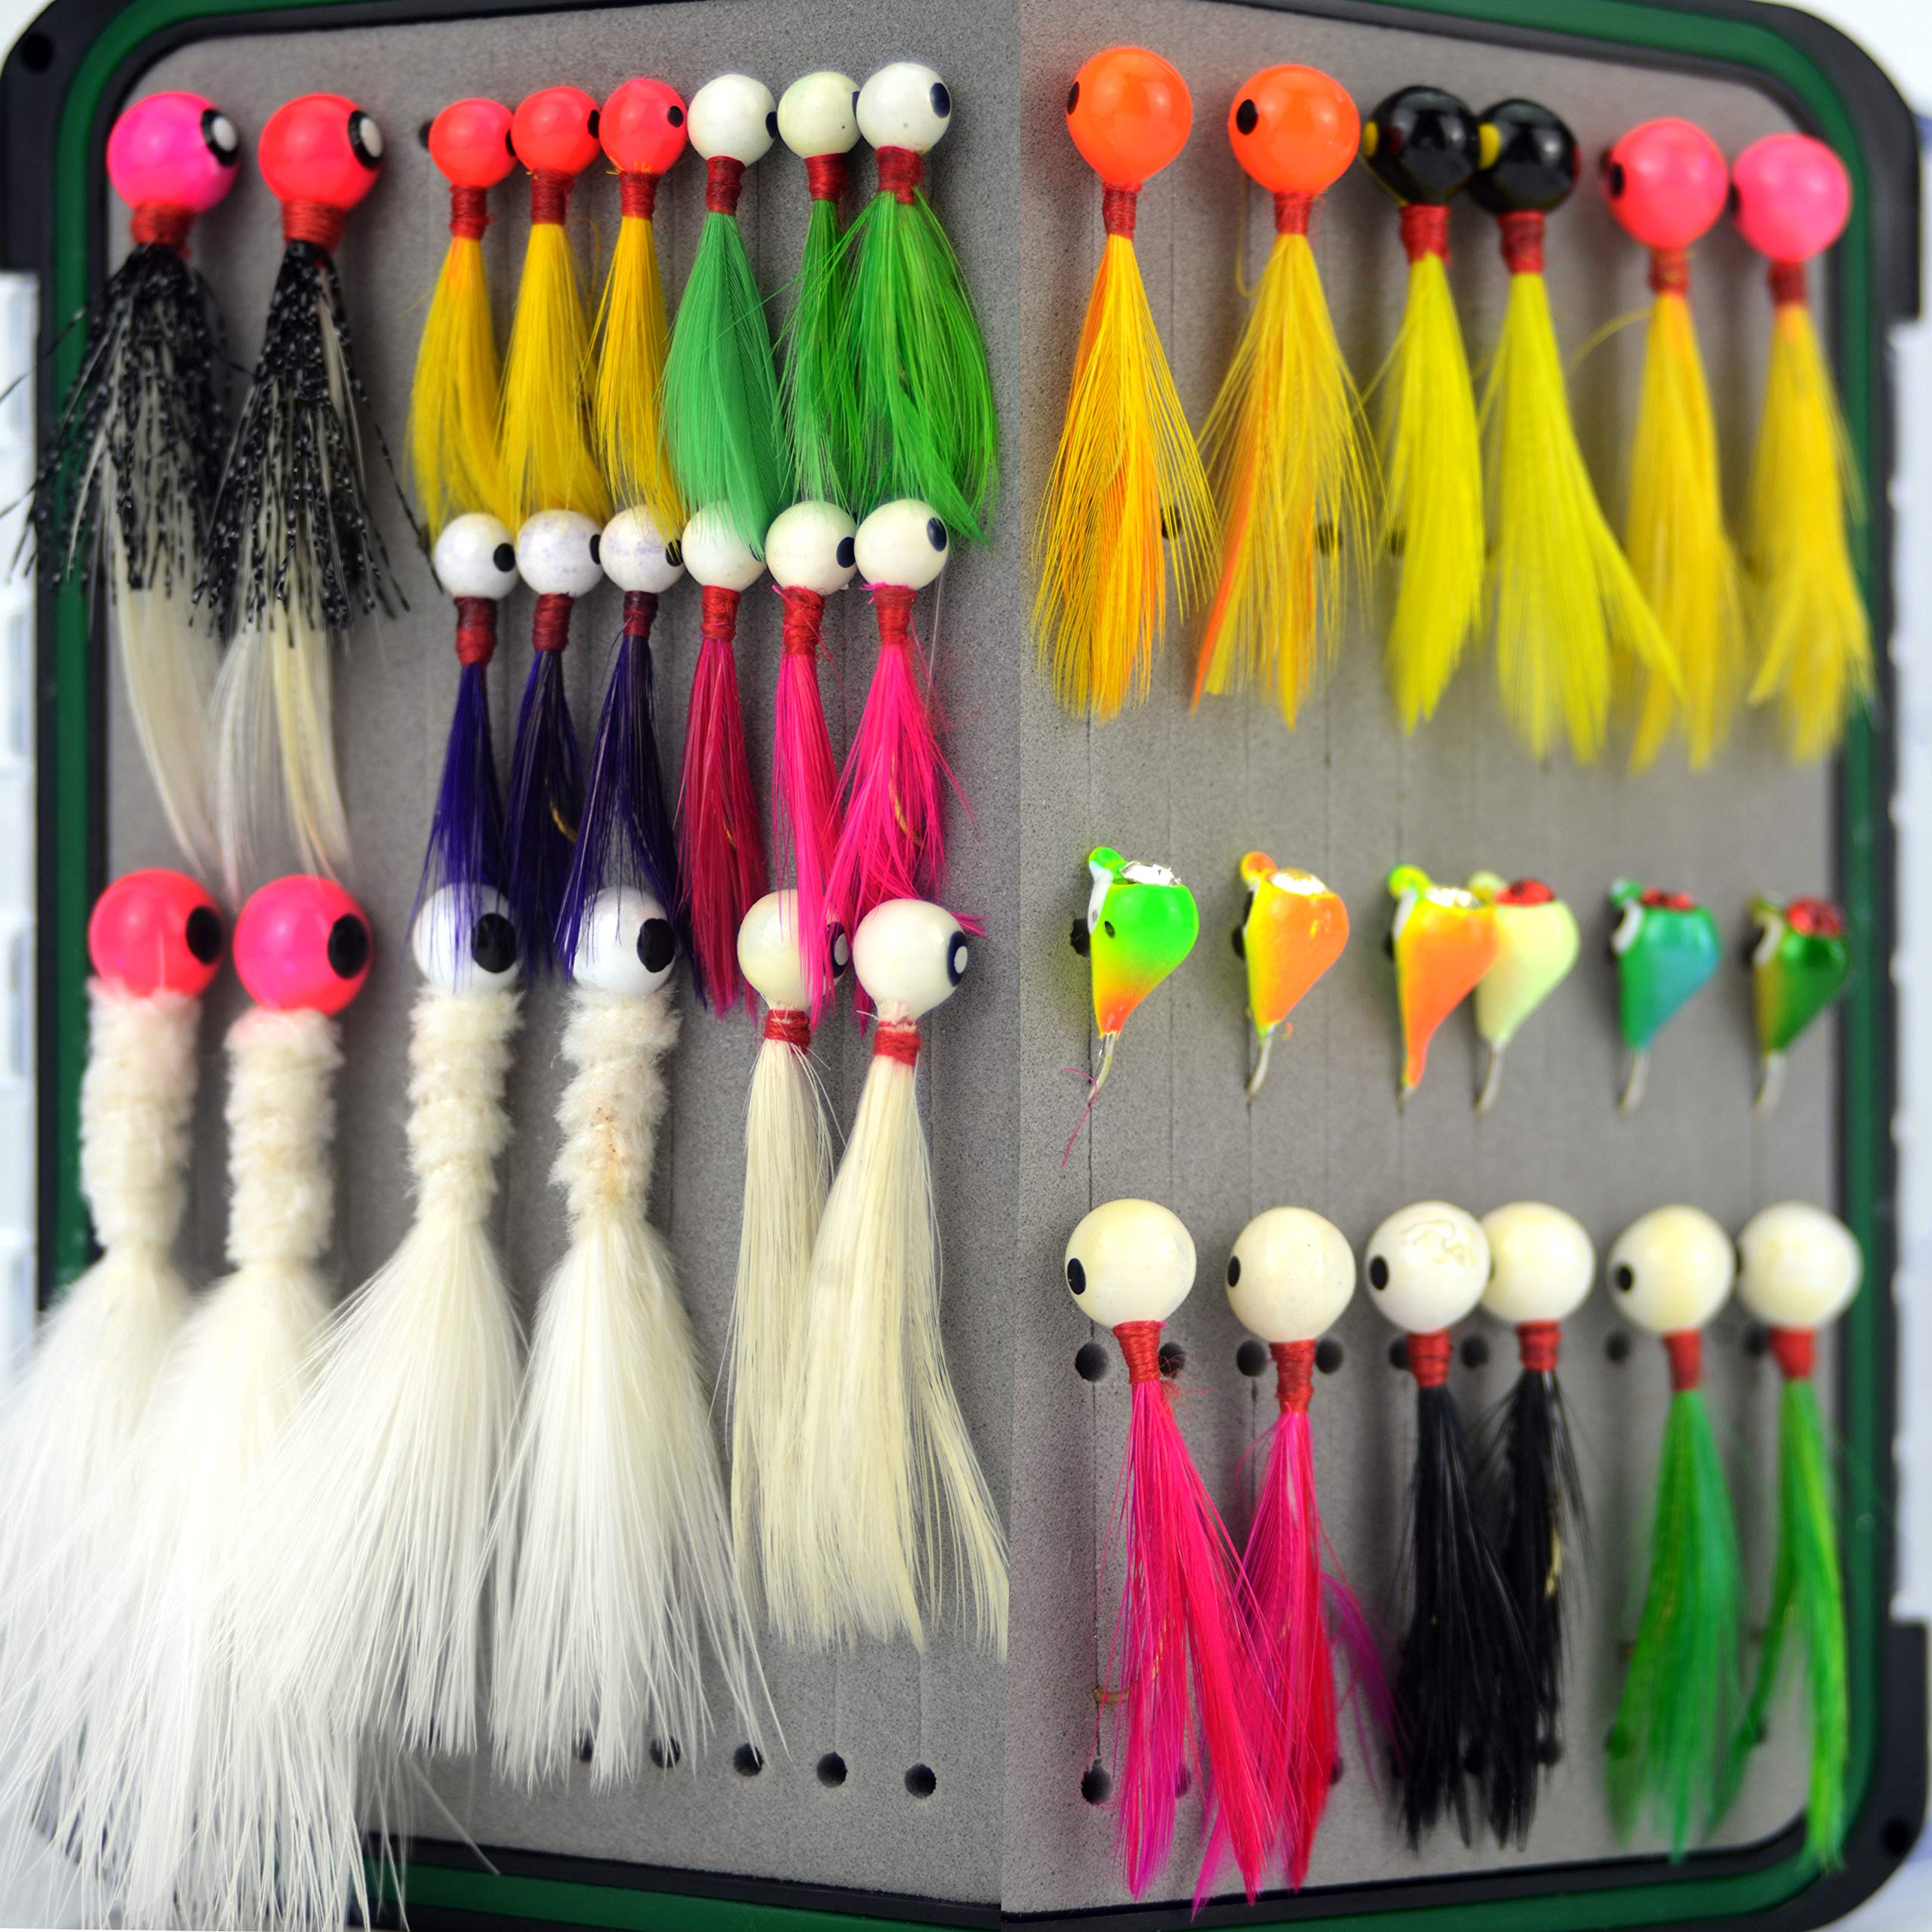 YAZHIDA Little Nipper jig 1/16-1/32oz Hand Tied Marabou Feather jig Fishing Lure kit for Panfish Sunfish Bluegil Perch Walleye Bass